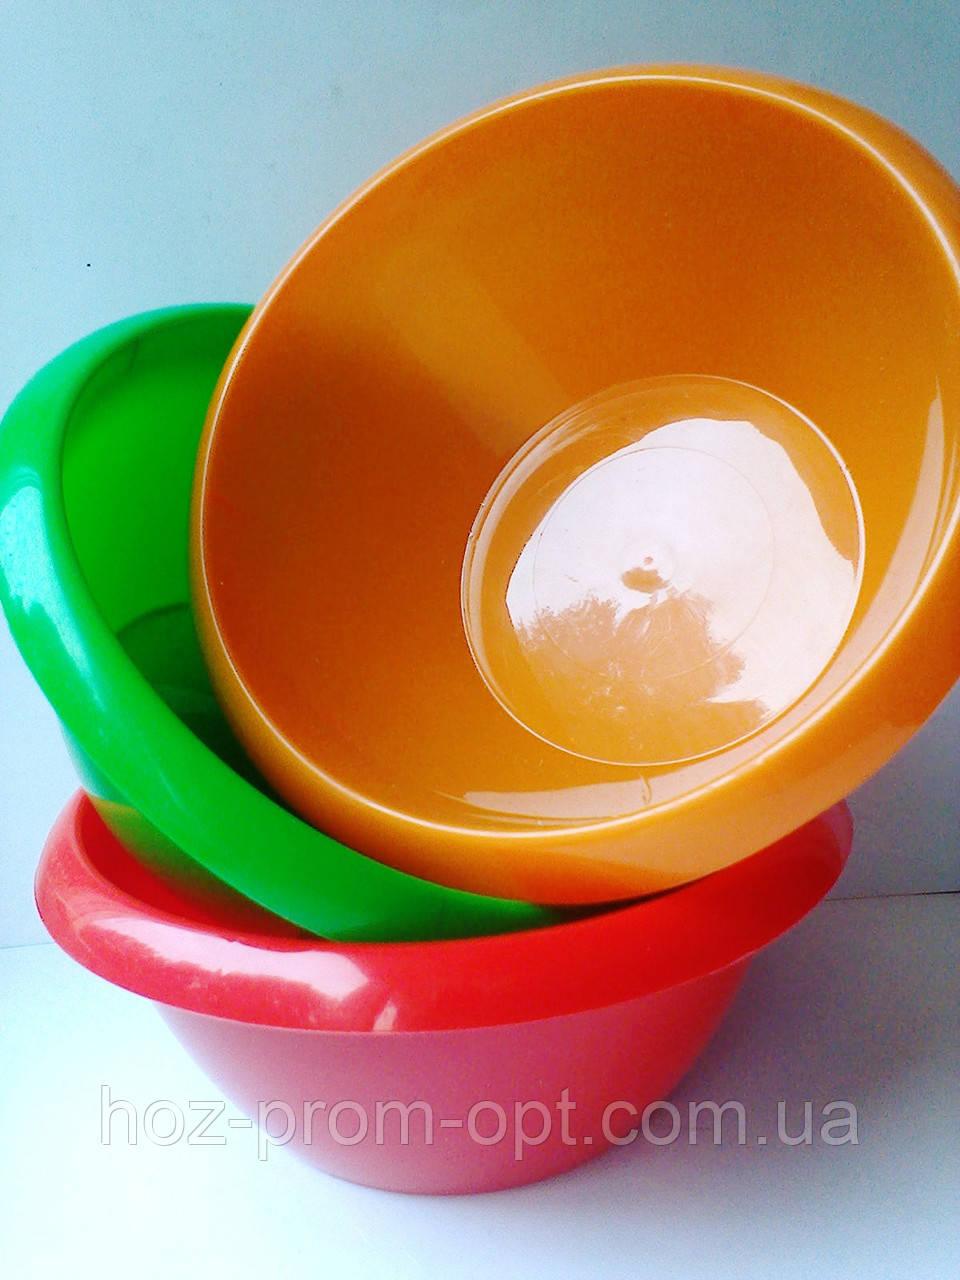 Миска 1.0 л, пищевой пластик.